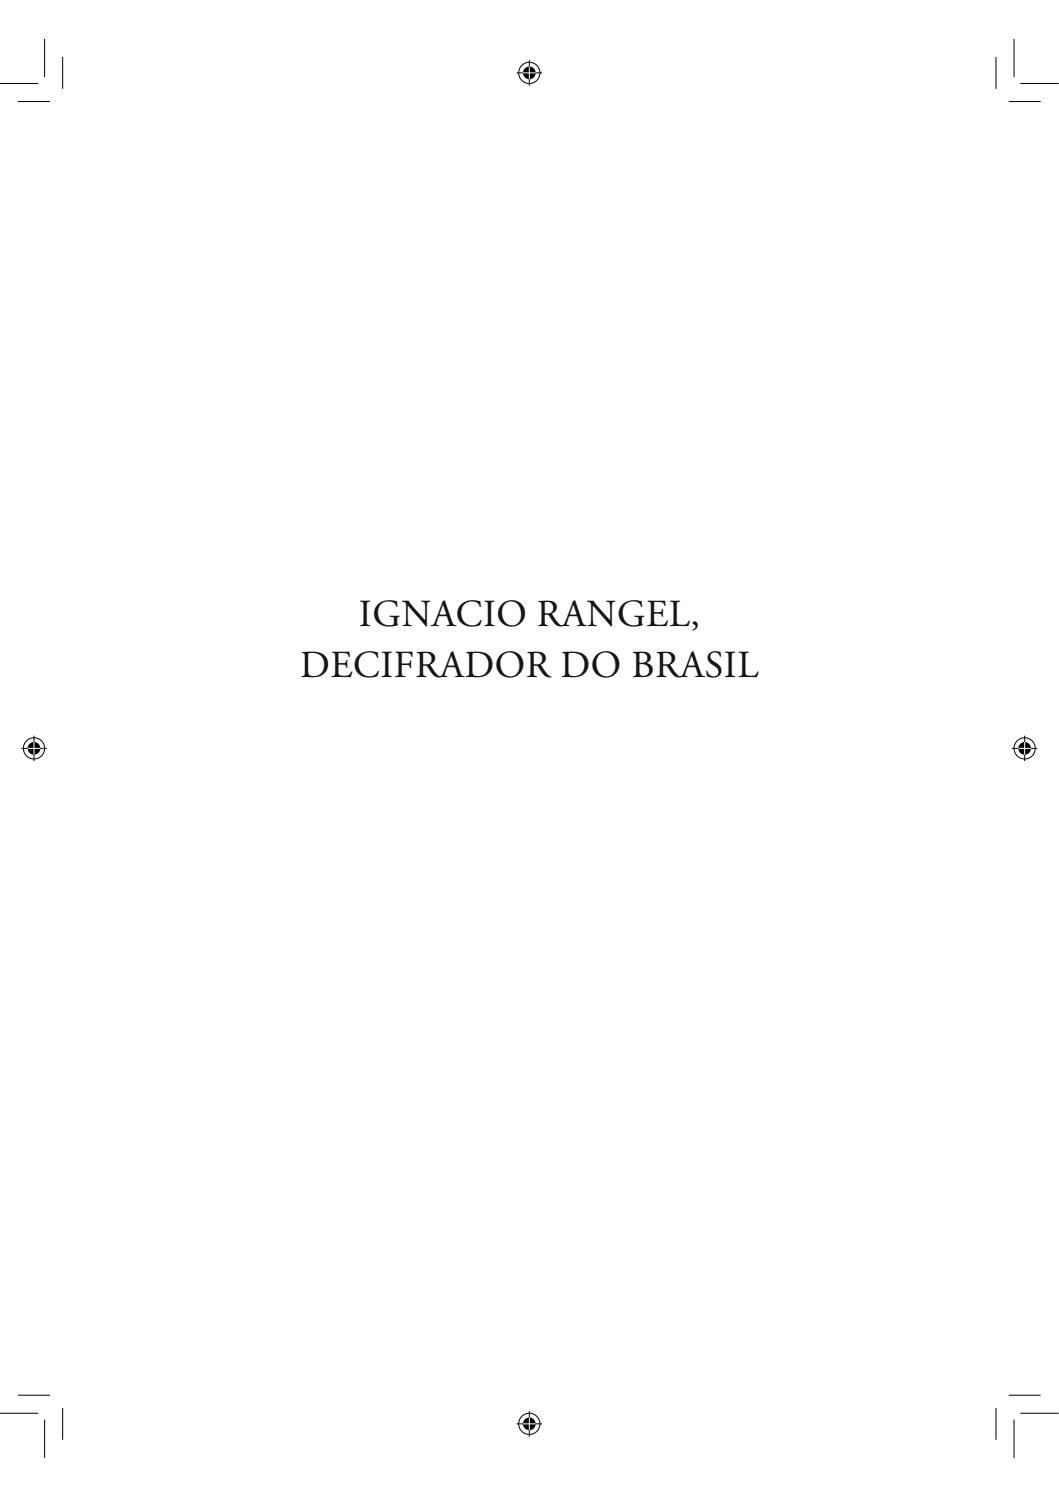 Ignacio Rangel Decifrador Do Brasil By Jhonatan Almada Issuu